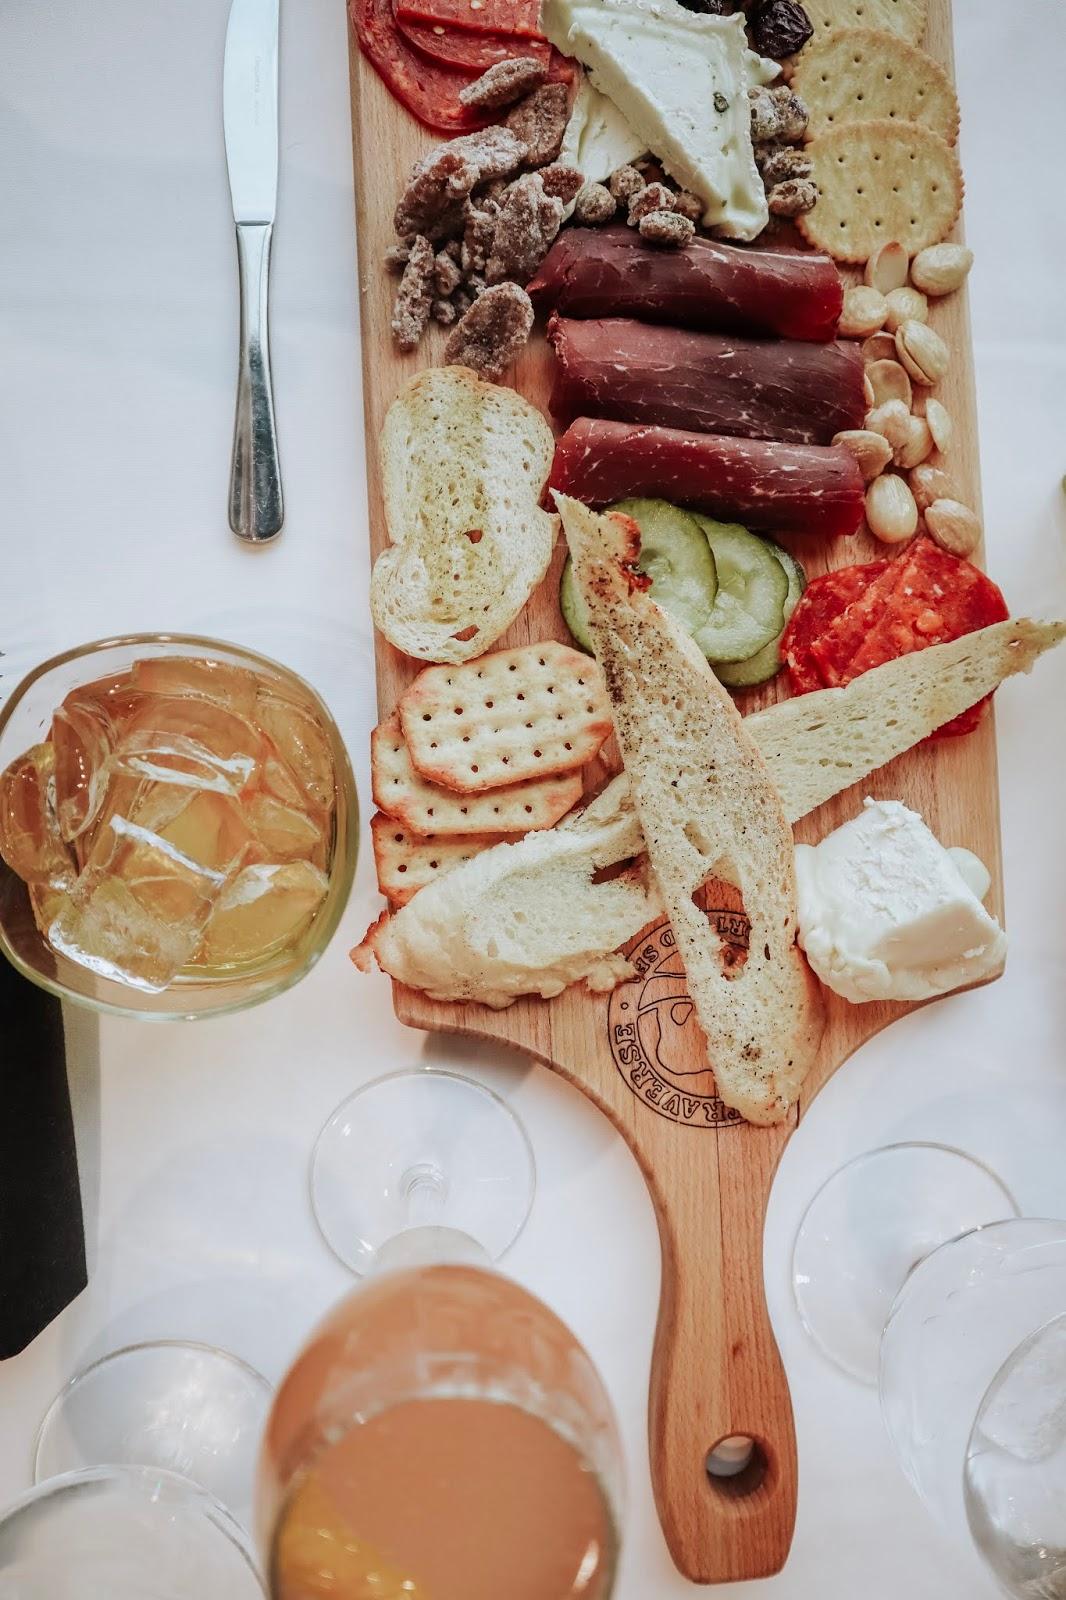 https://www.grandtraverseresort.com/dining/aerie-restaurant-lounge/menus